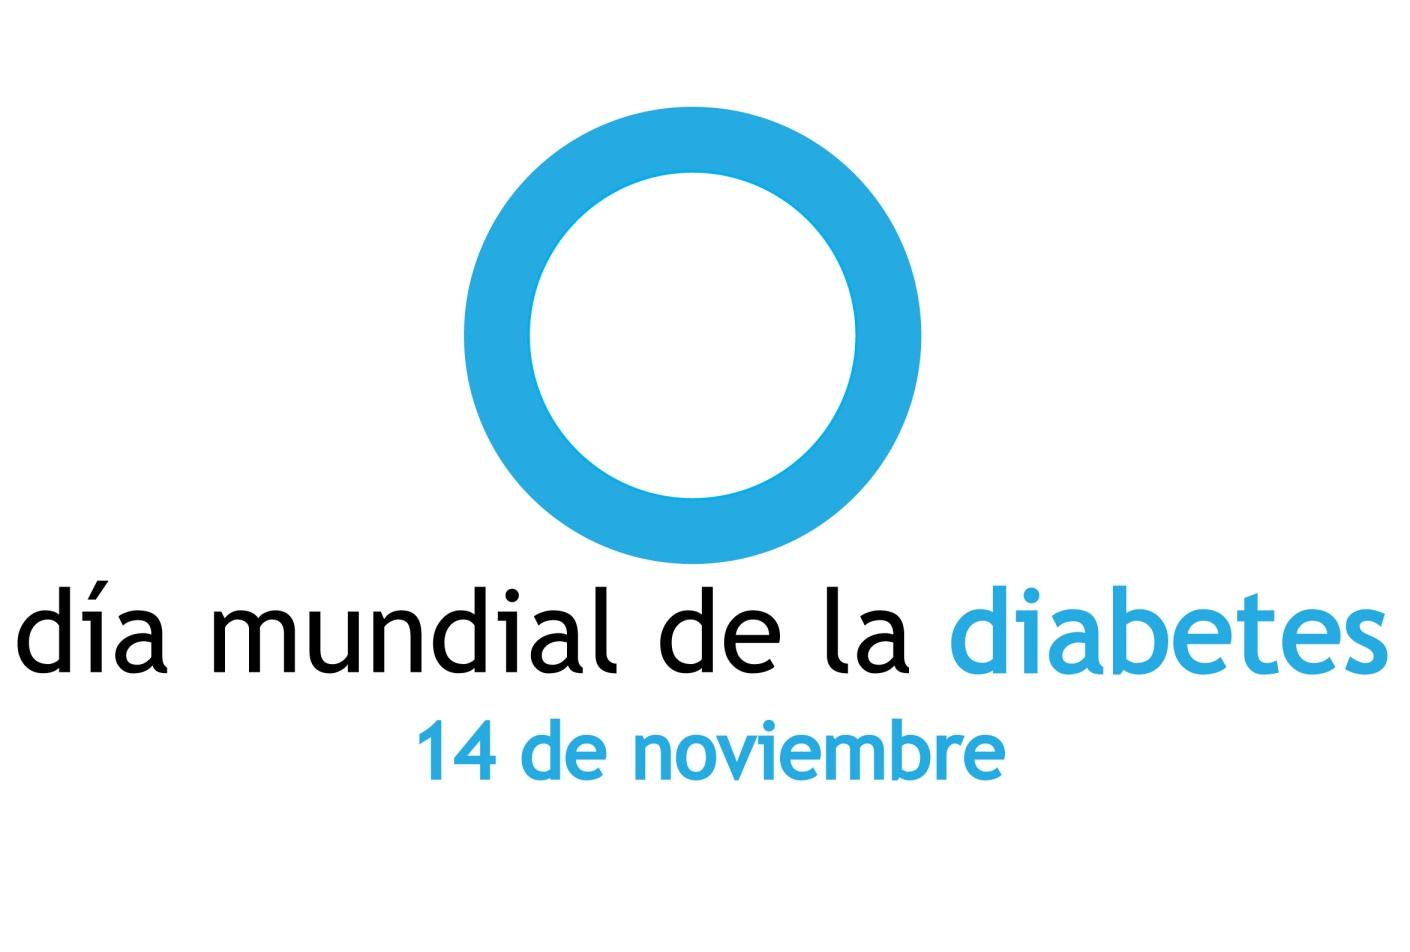 Dia-Mundial-de-la-diabetes_248441